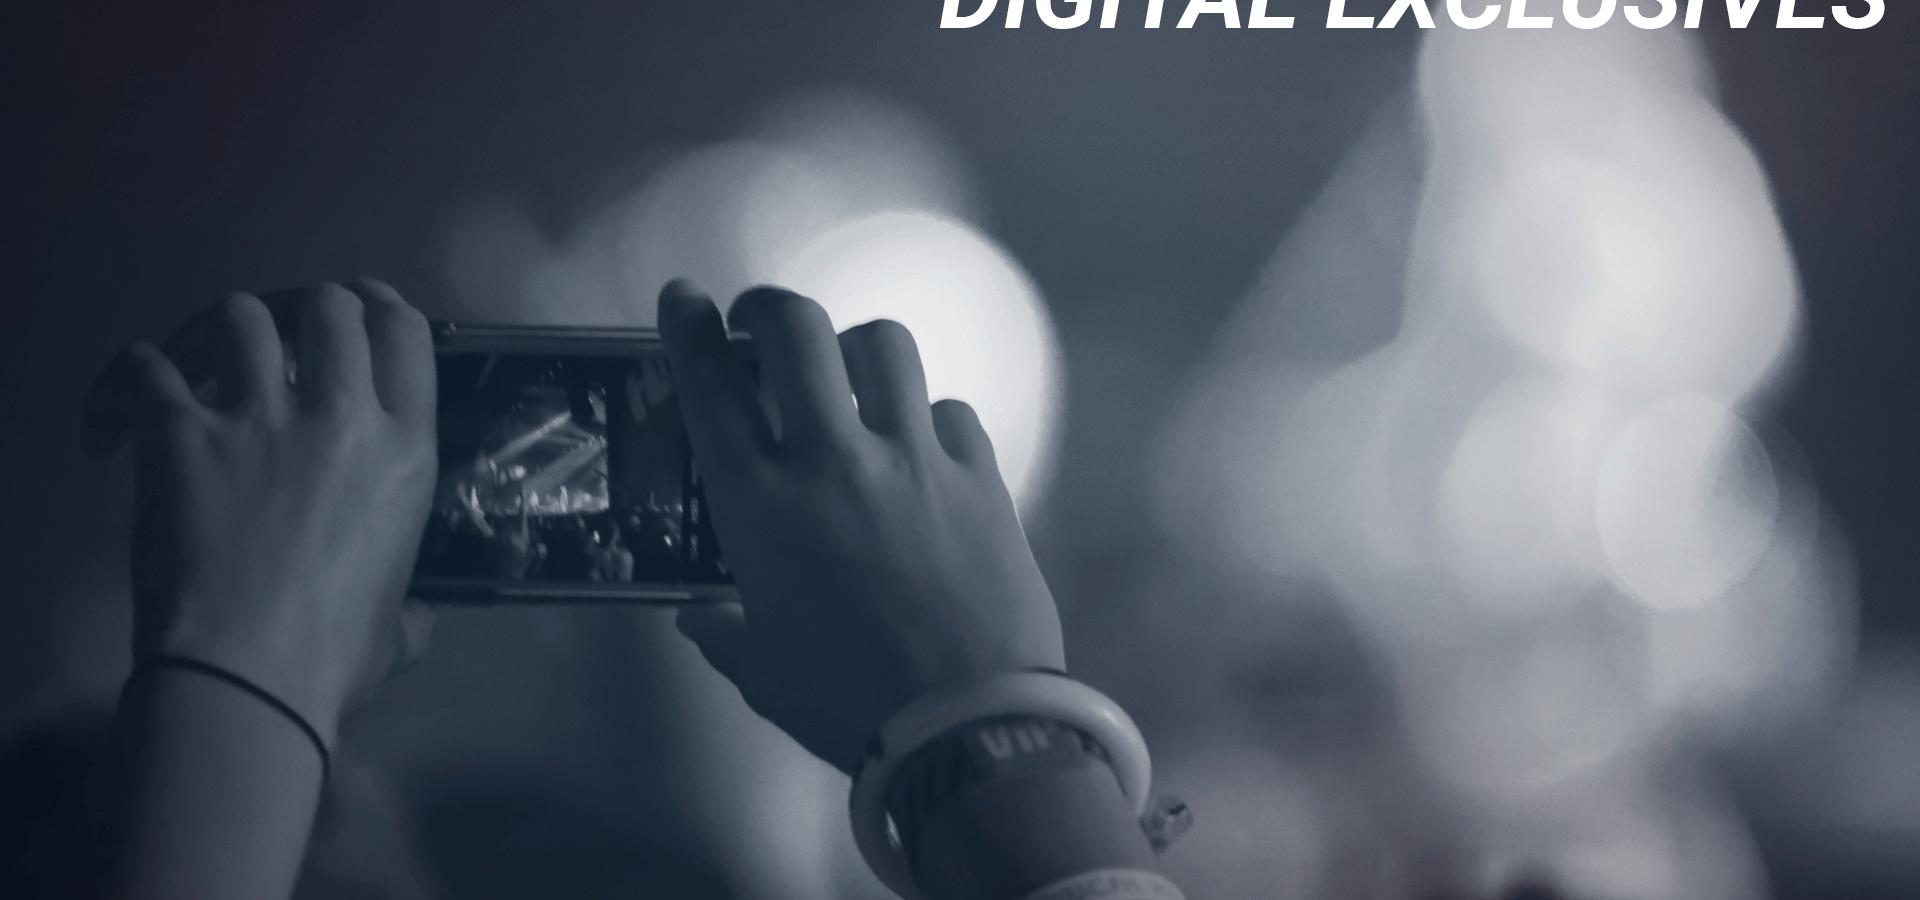 Digital Exclusives